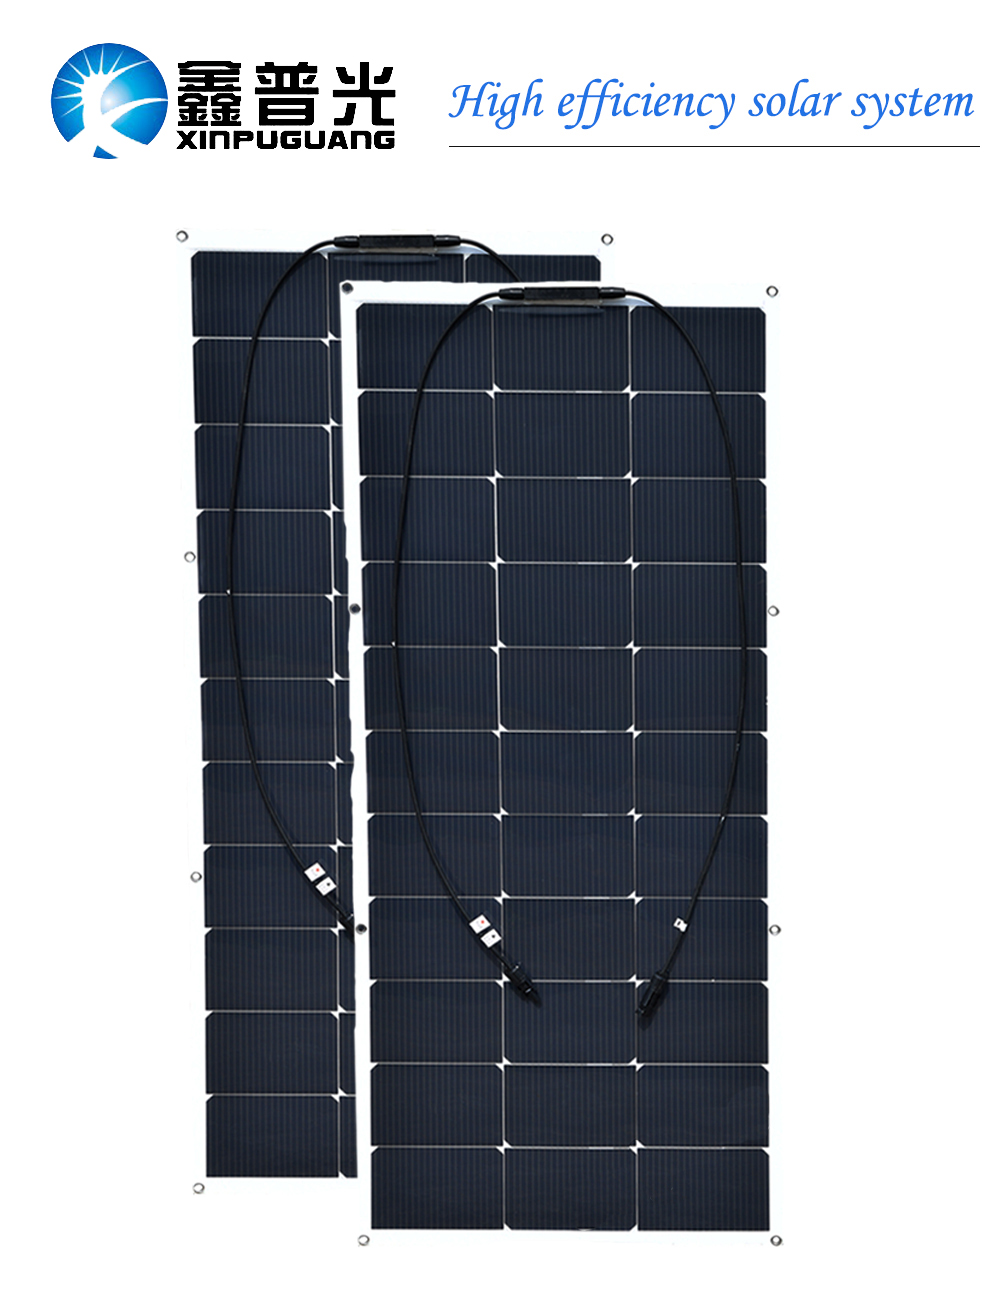 2pcs 100w semi flexible solar panel High efficiency monocrystalline silicon cell module for car RV yacht boat home power